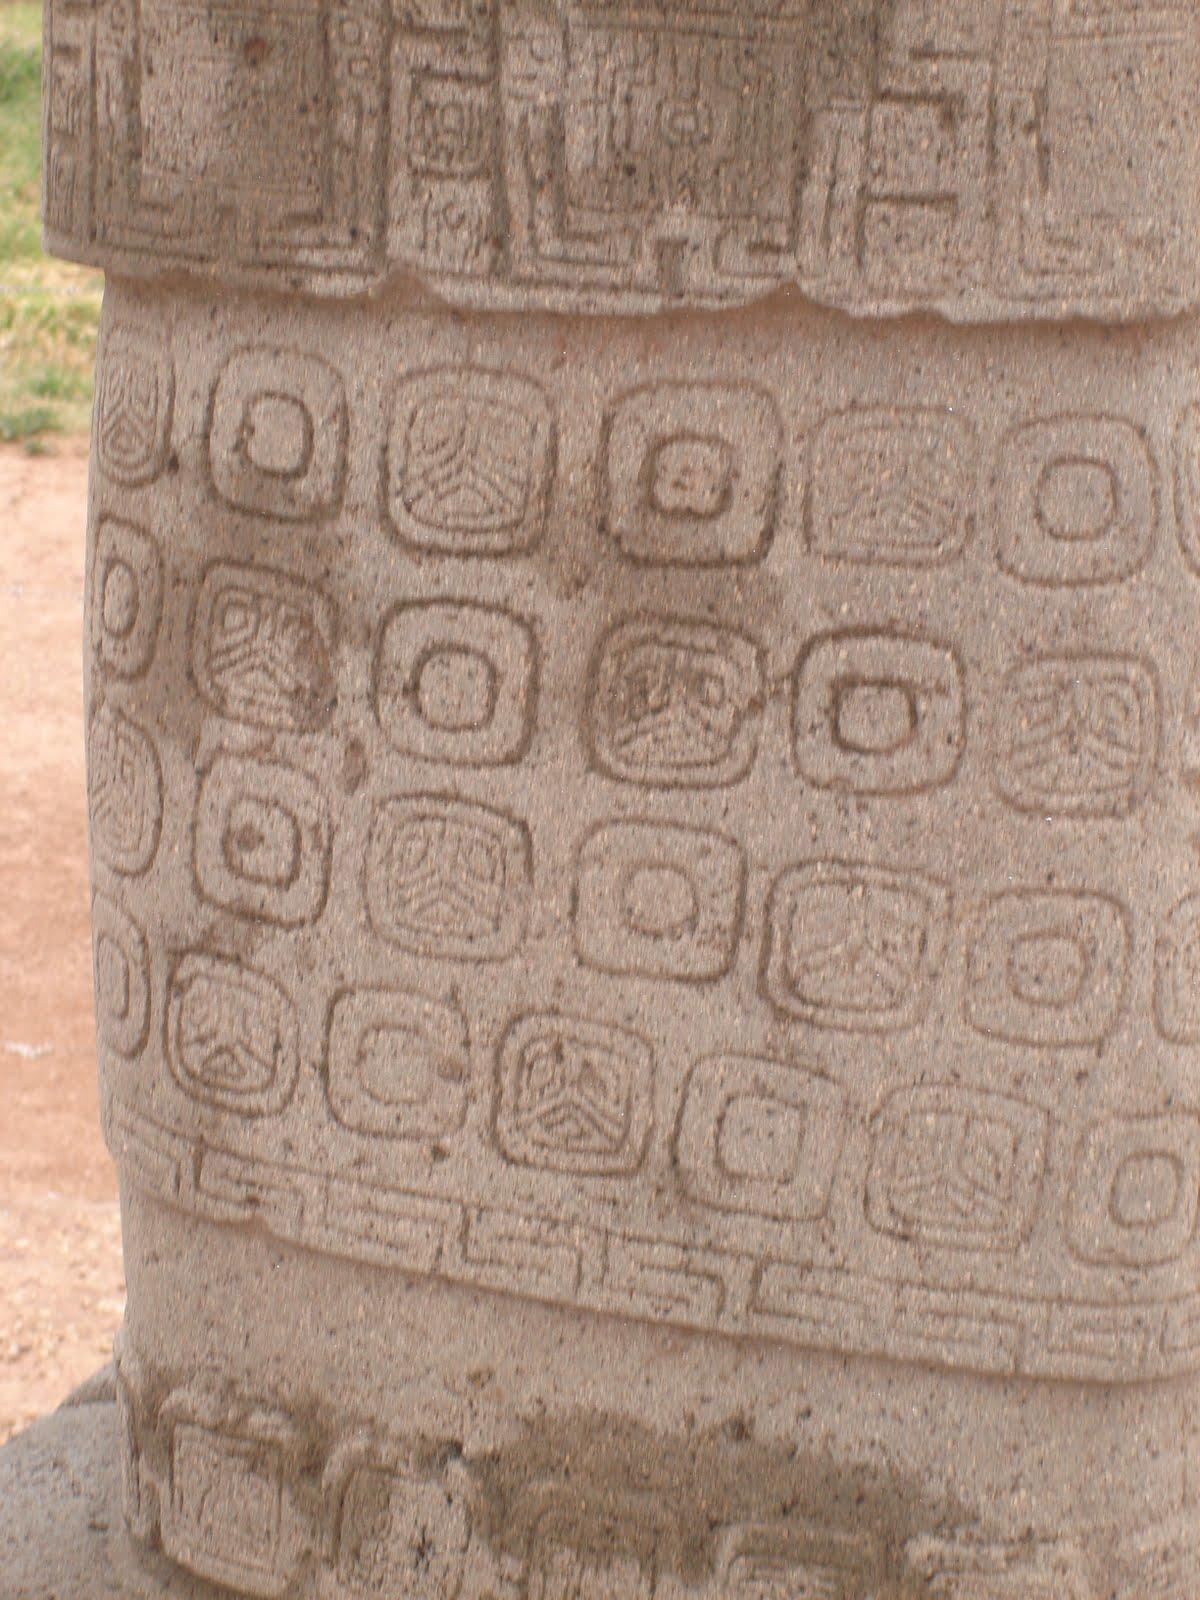 Pumapunku Language Ancient Manuscript